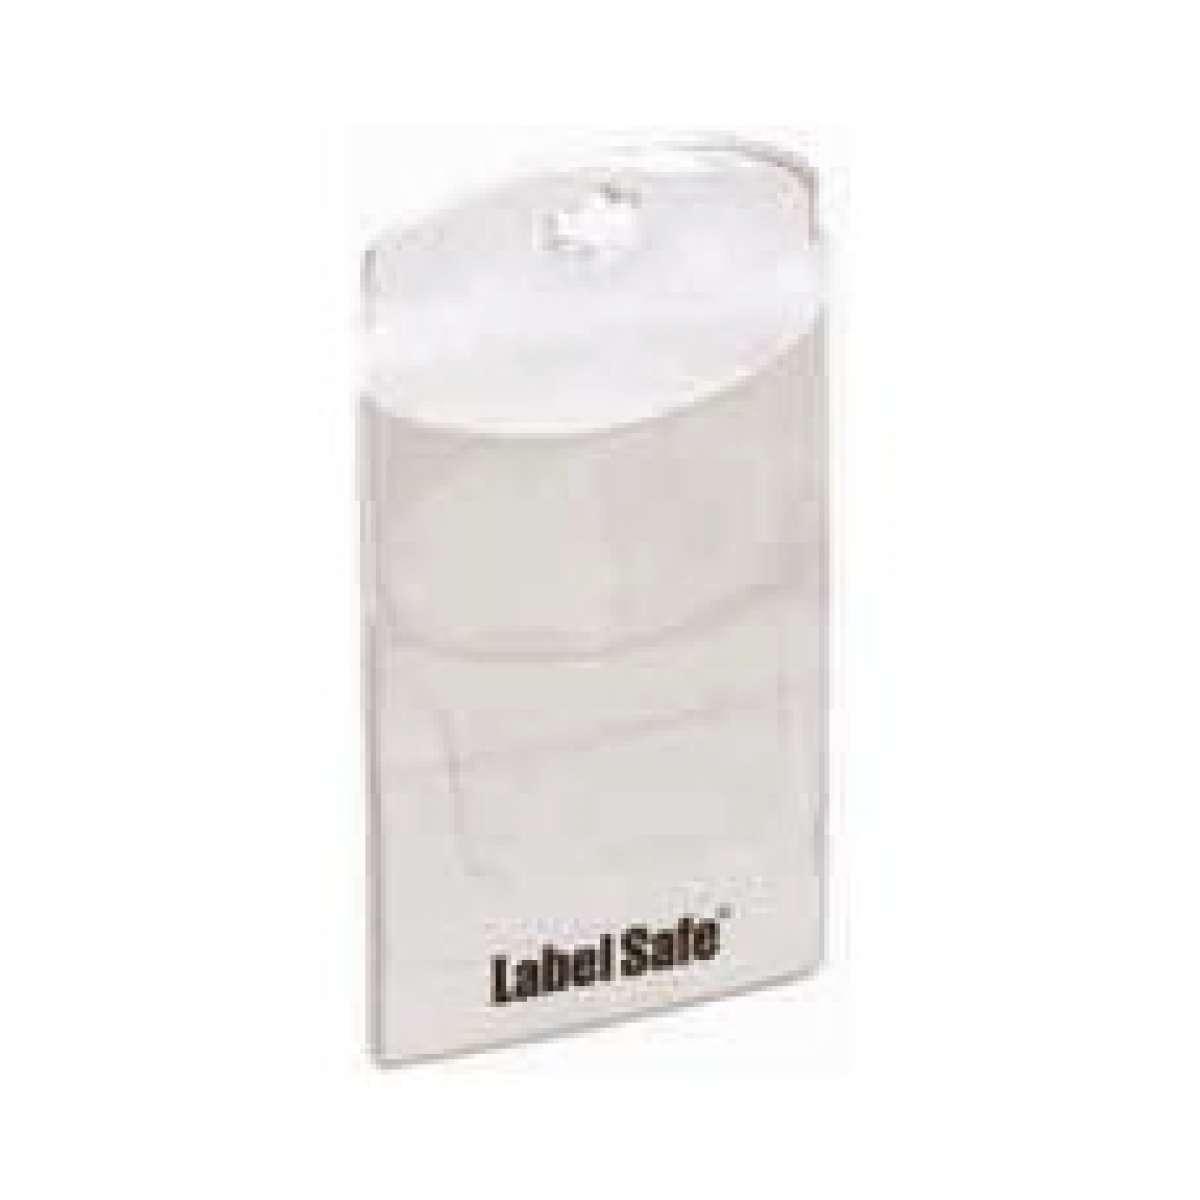 "Label Pocket (2"" X 3.5"")"